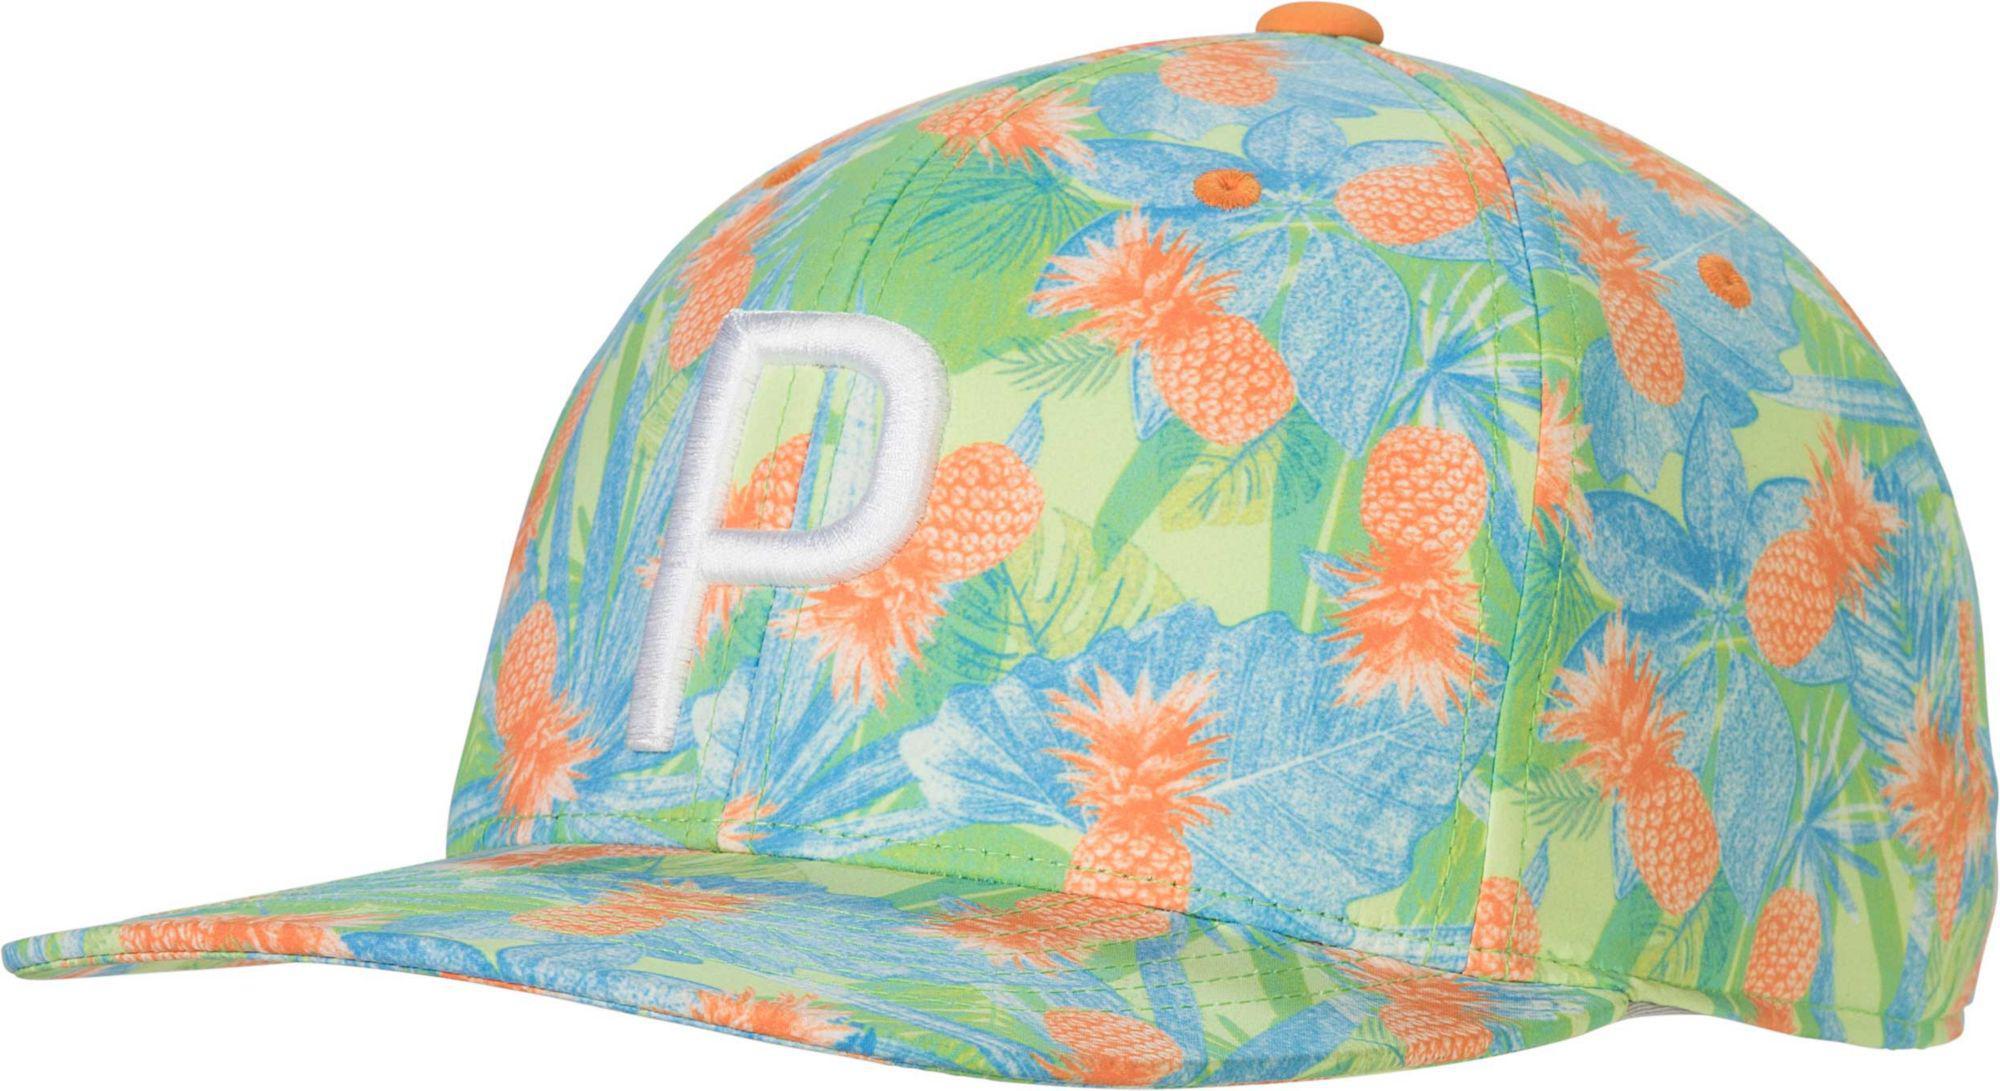 9ec8c62d8b0 Lyst - PUMA P 110 Sb2k18 Golf Hat in Green for Men